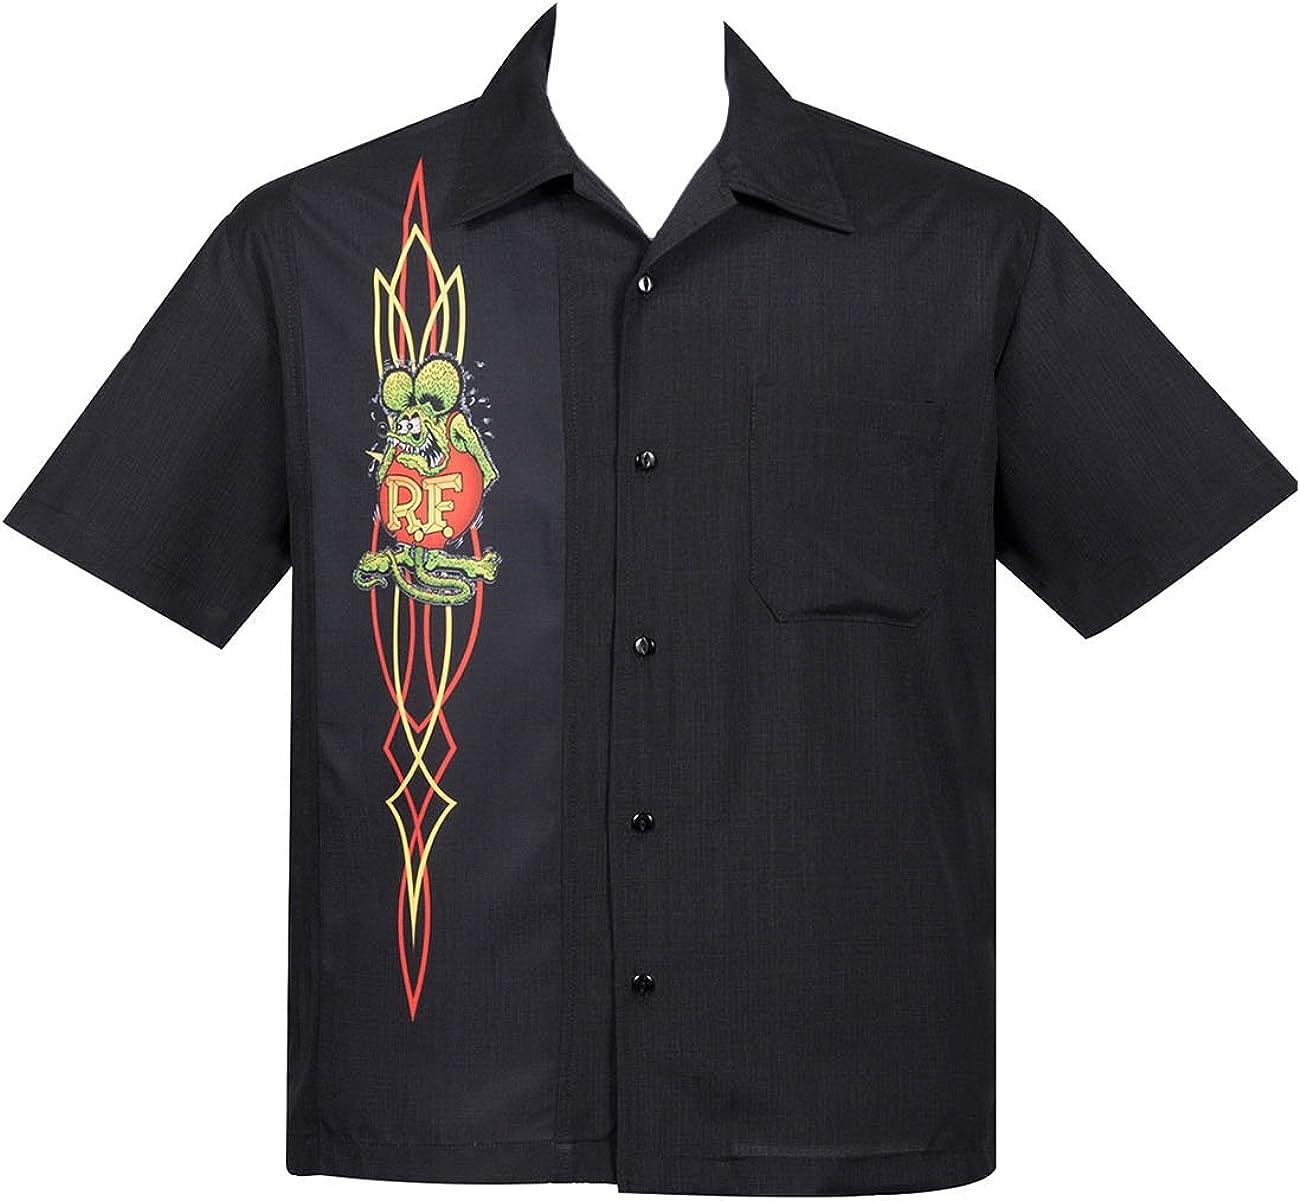 Steady Rat Fink by Clothing Pinstripe Panel Rockabilly Bowling - Camiseta para hombre Negro S: Amazon.es: Ropa y accesorios